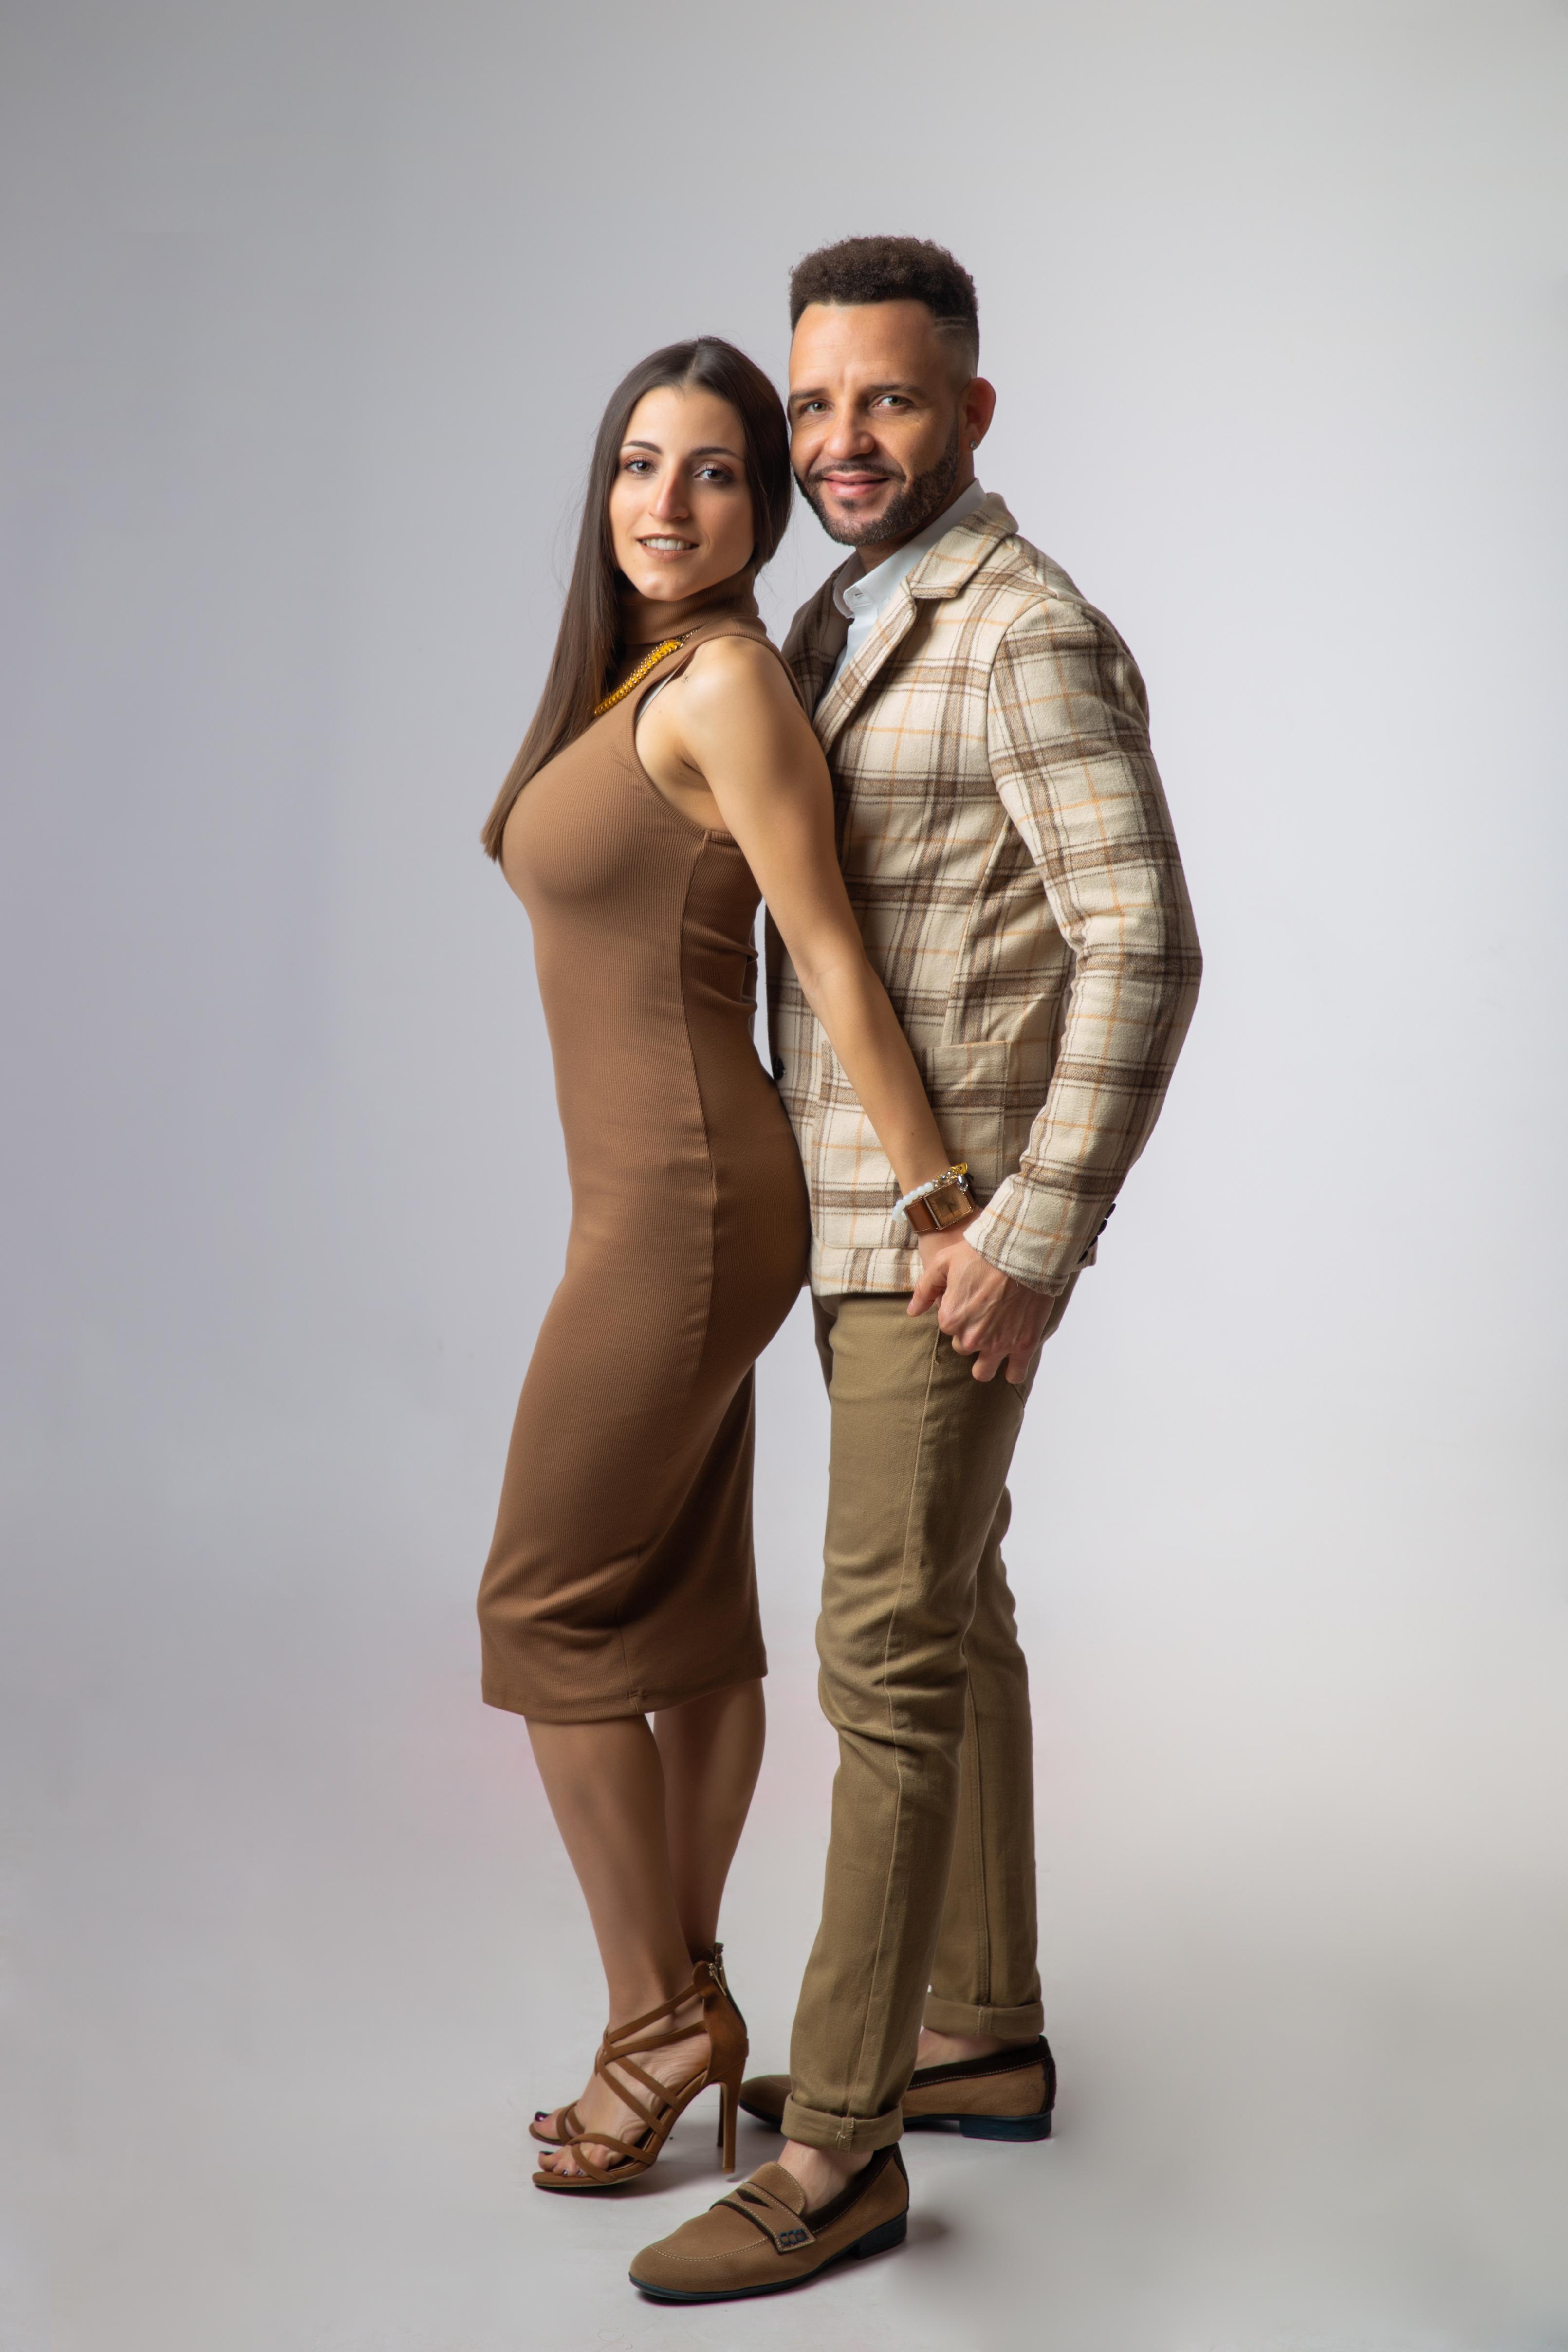 Clases de Bachata Online con Anthony & Carla